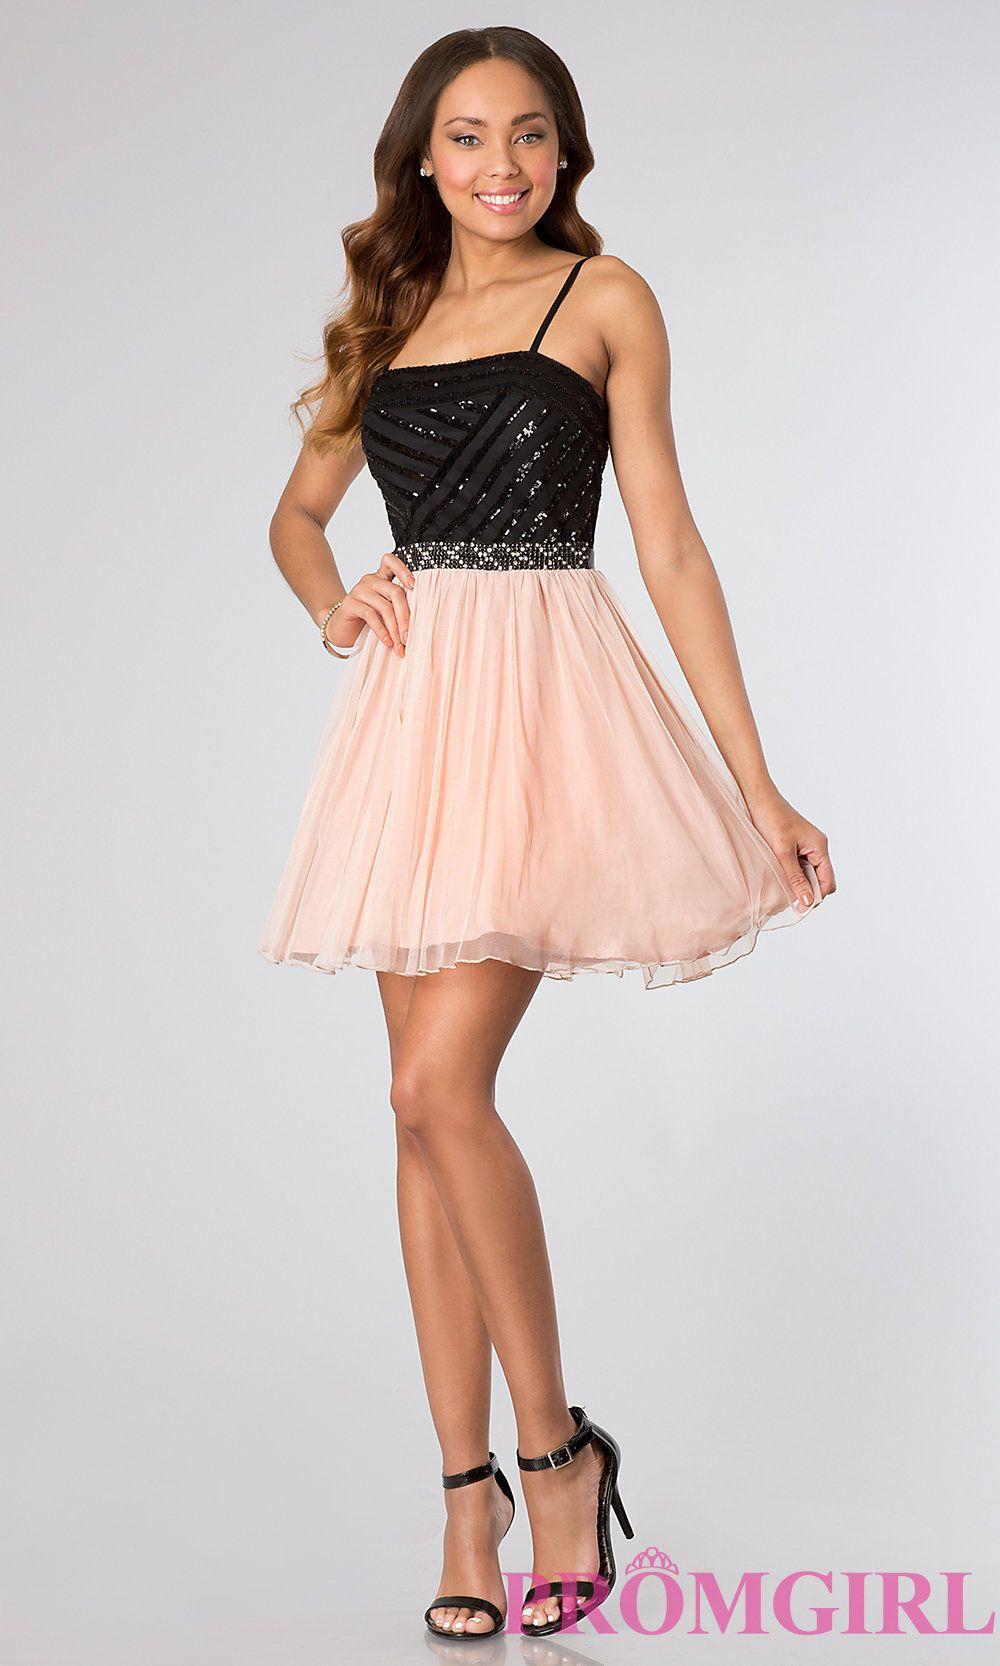 Short Prom Dress Style: AS-I9447j97g5 Detail Image 1 | Dresses ...